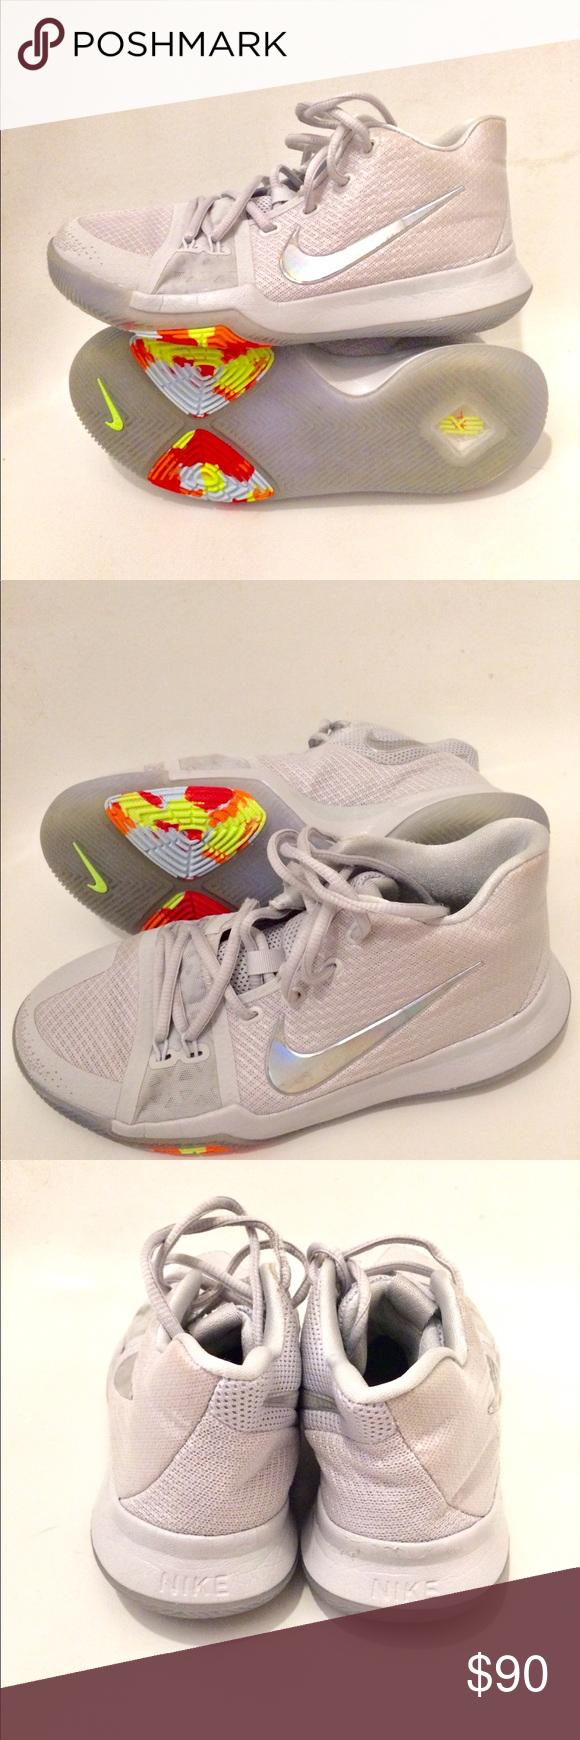 Nike Youth Basketball Shoes Size 5